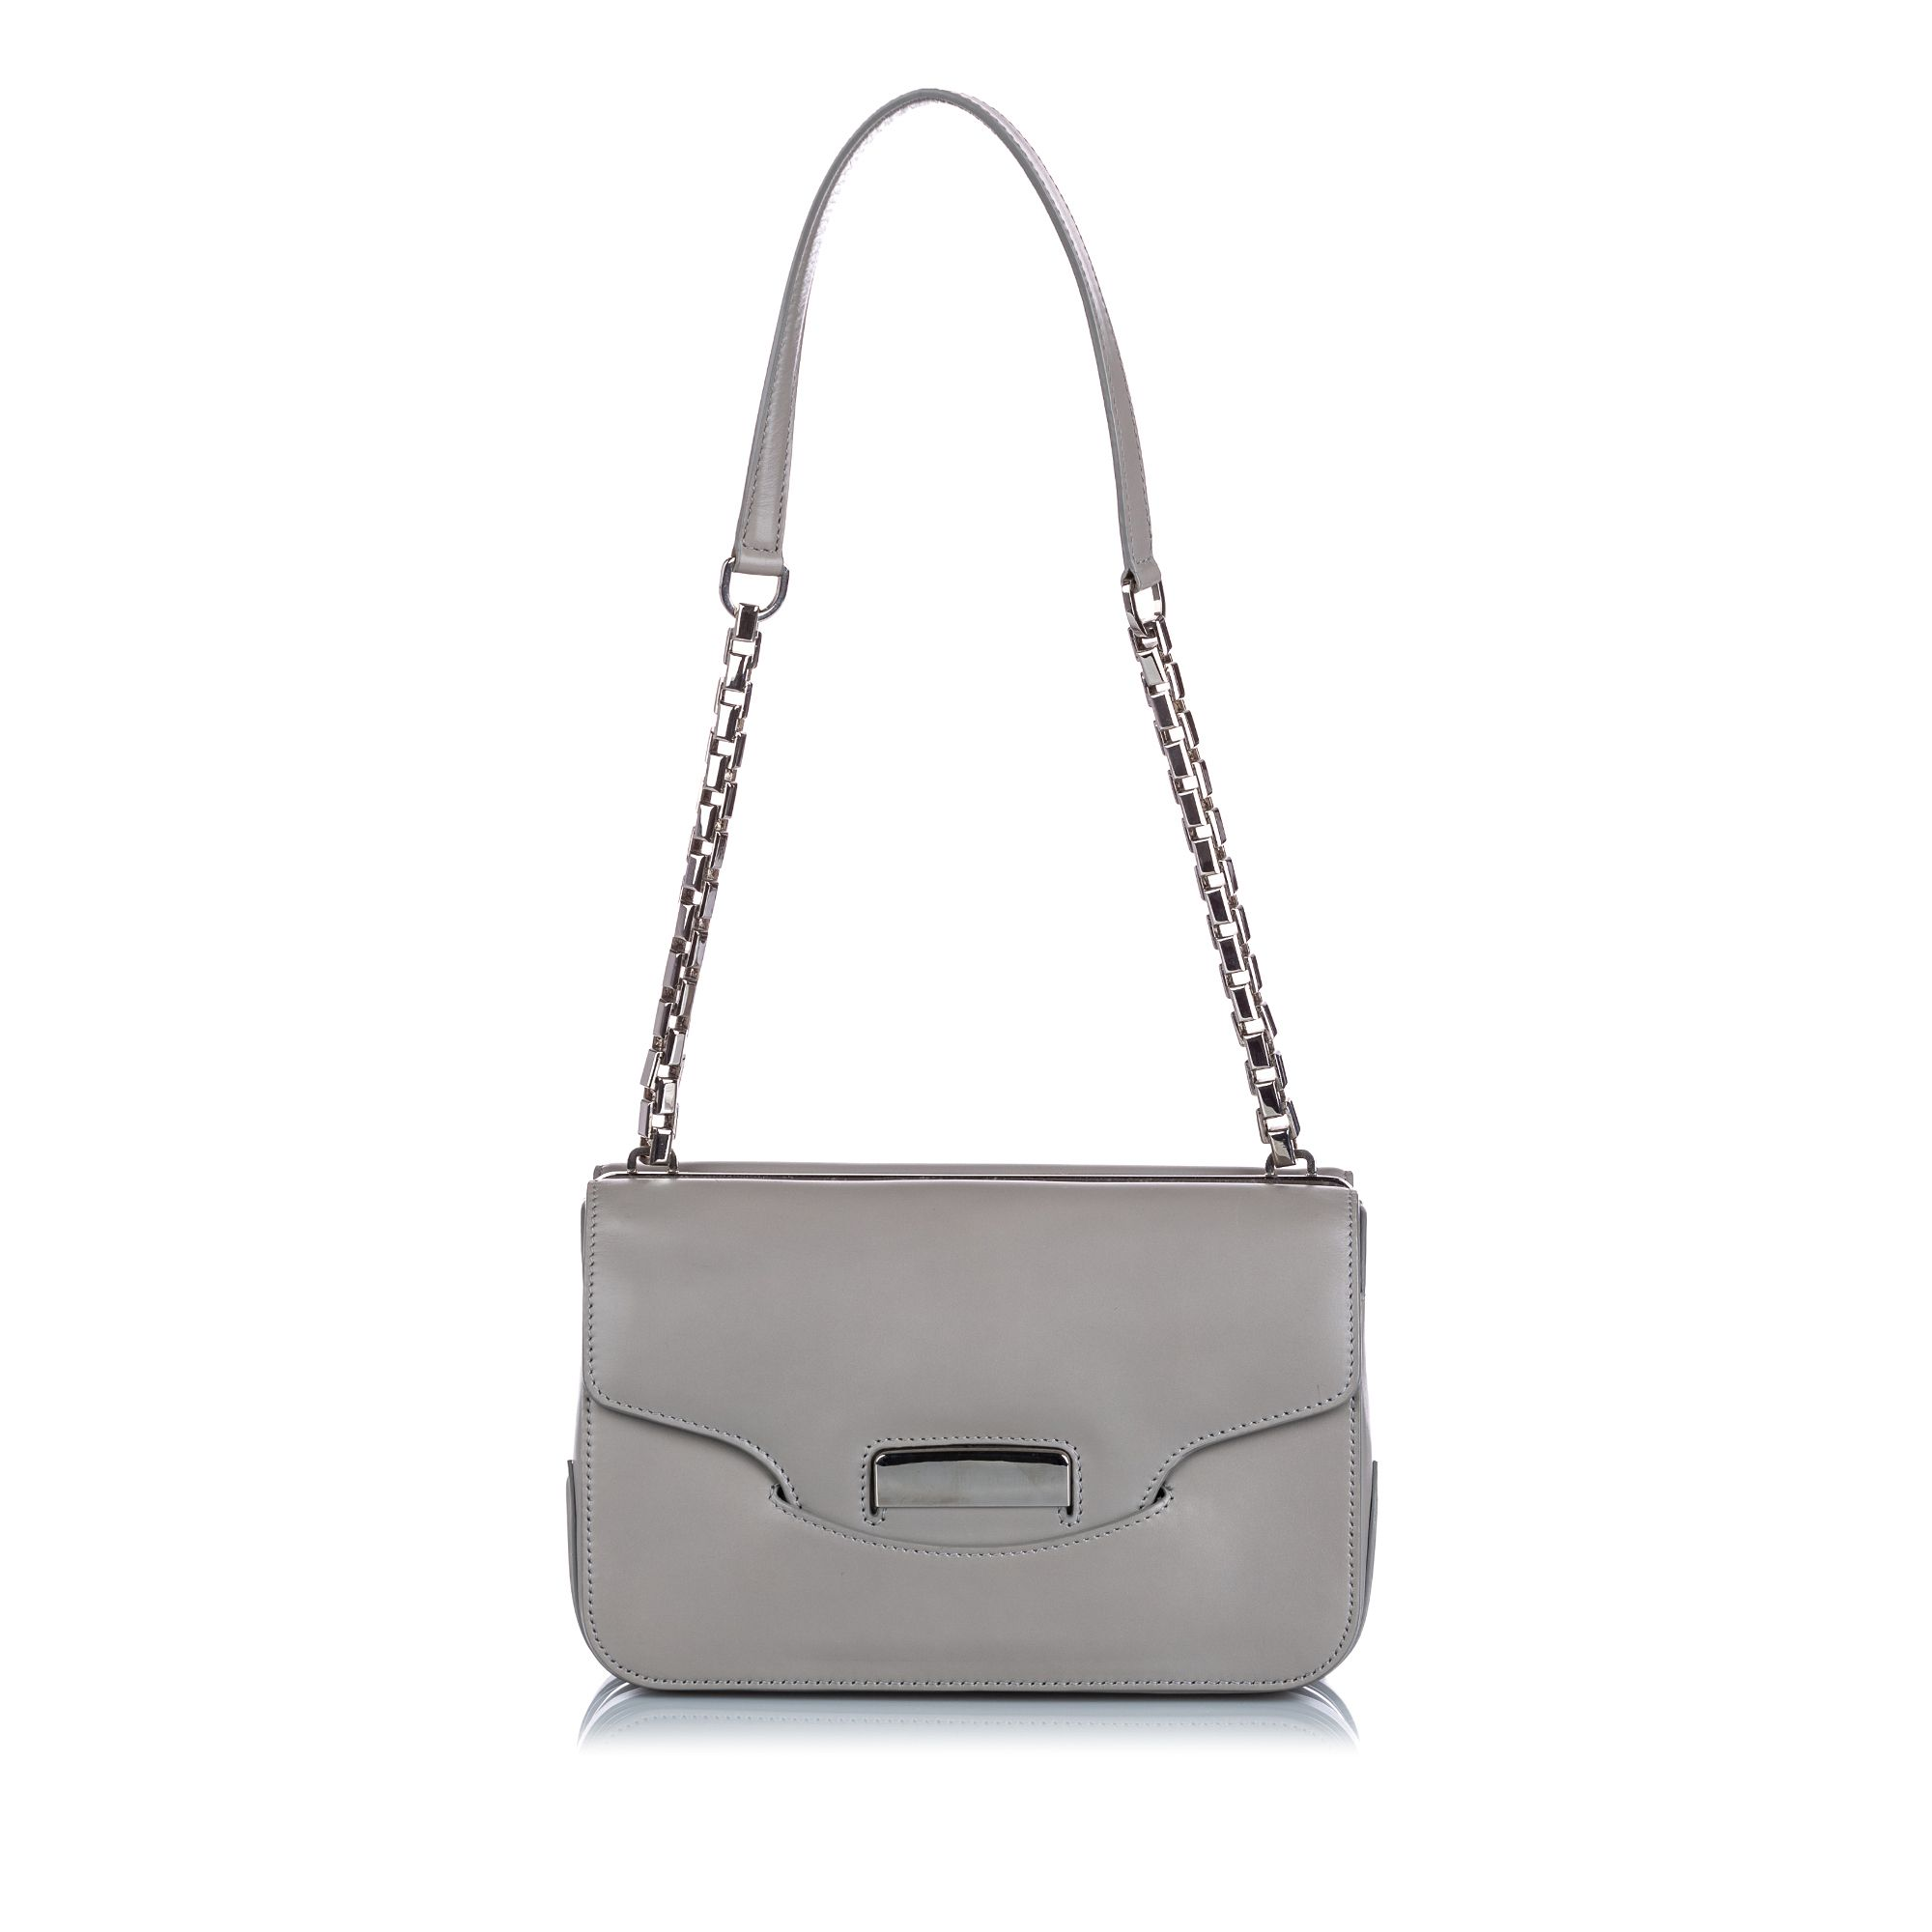 Vintage Balenciaga Leather Neo Classic Chain Bag Brown